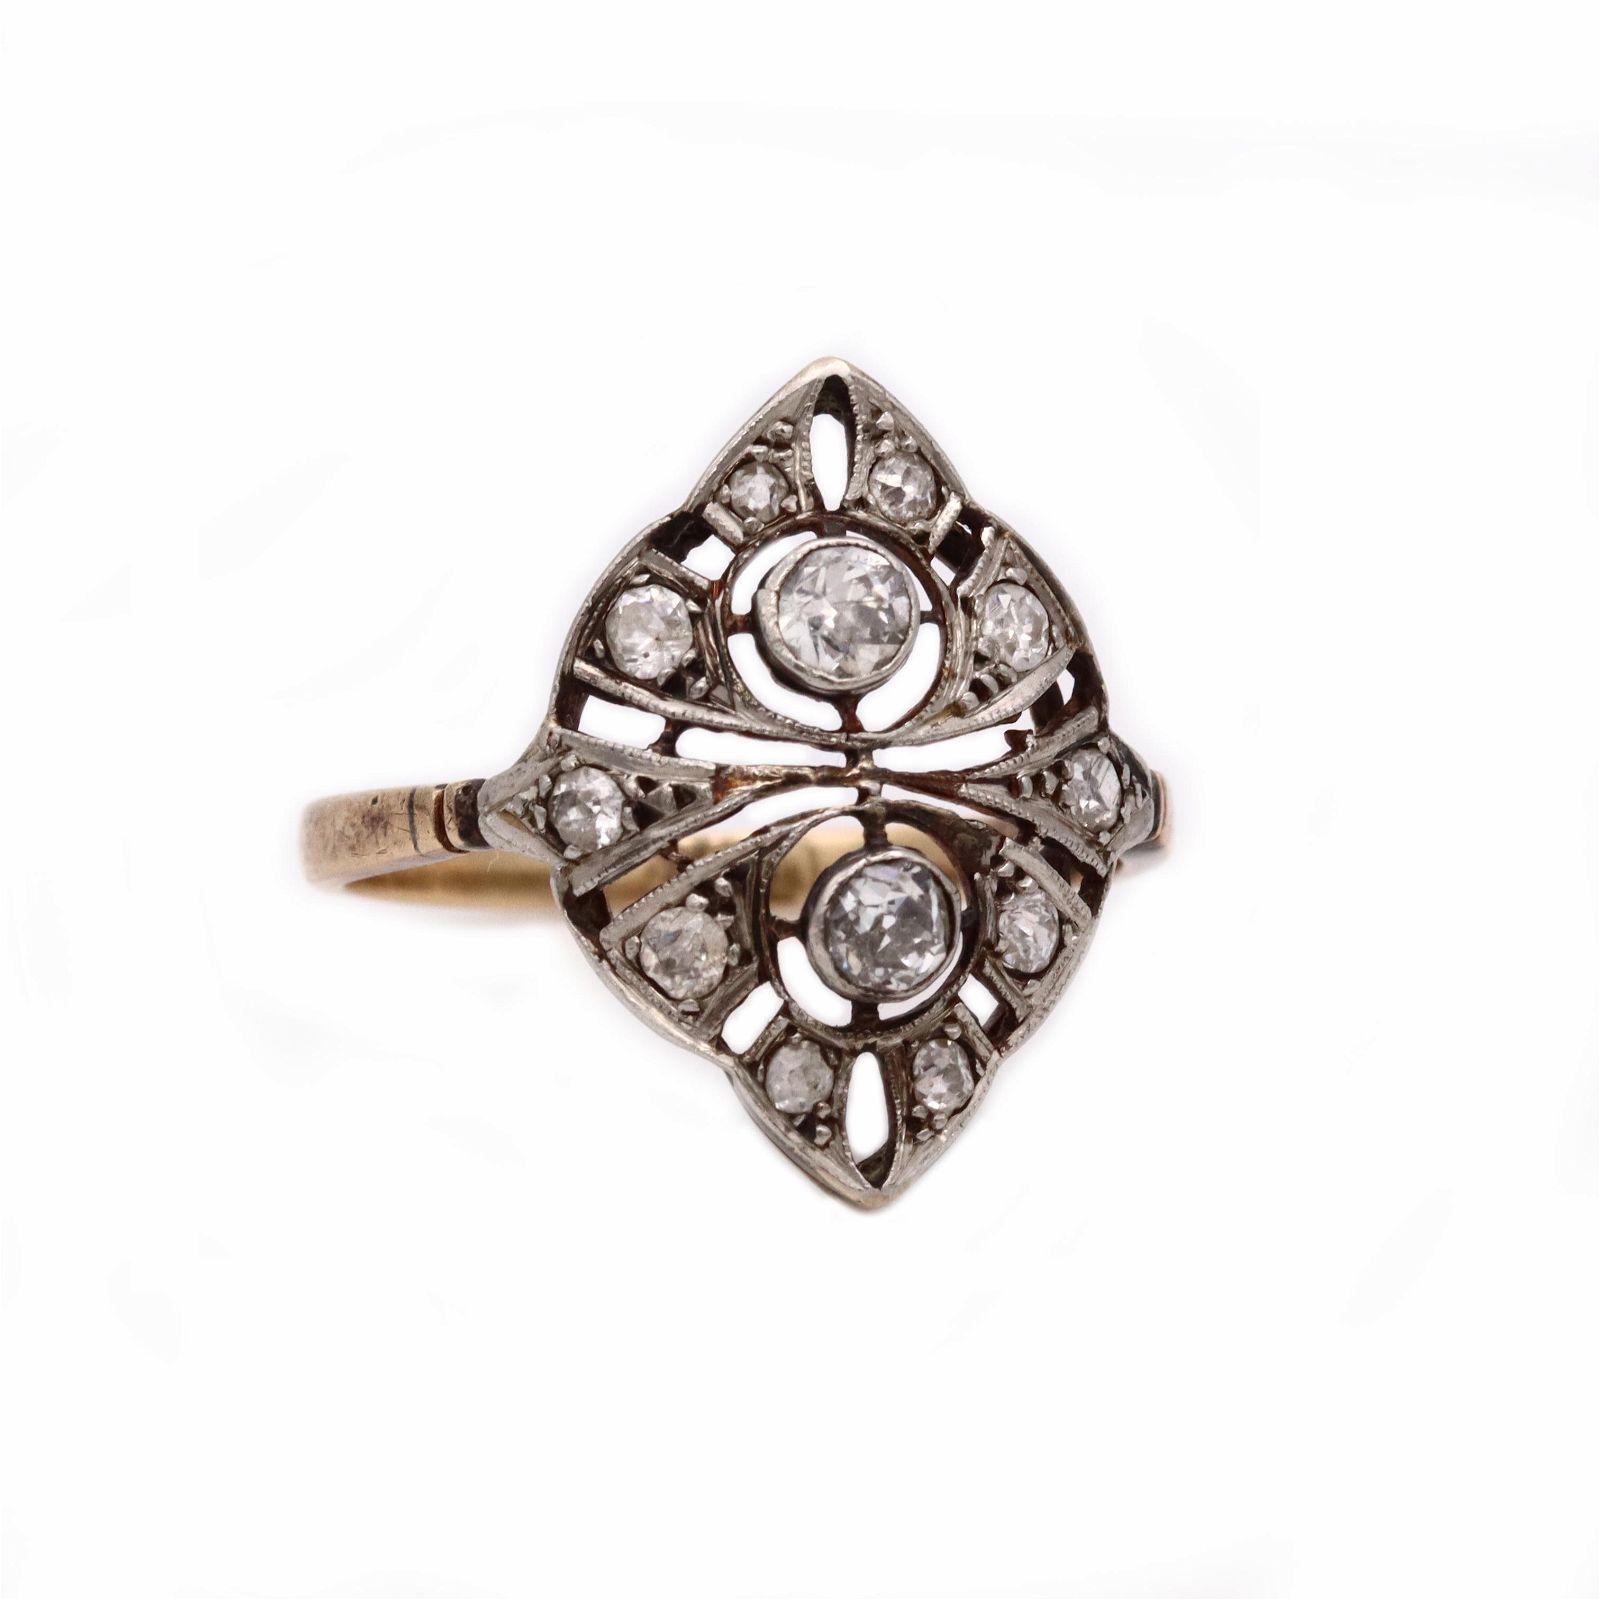 Edwardian Diamonds Platinum & 18k Gold Ring